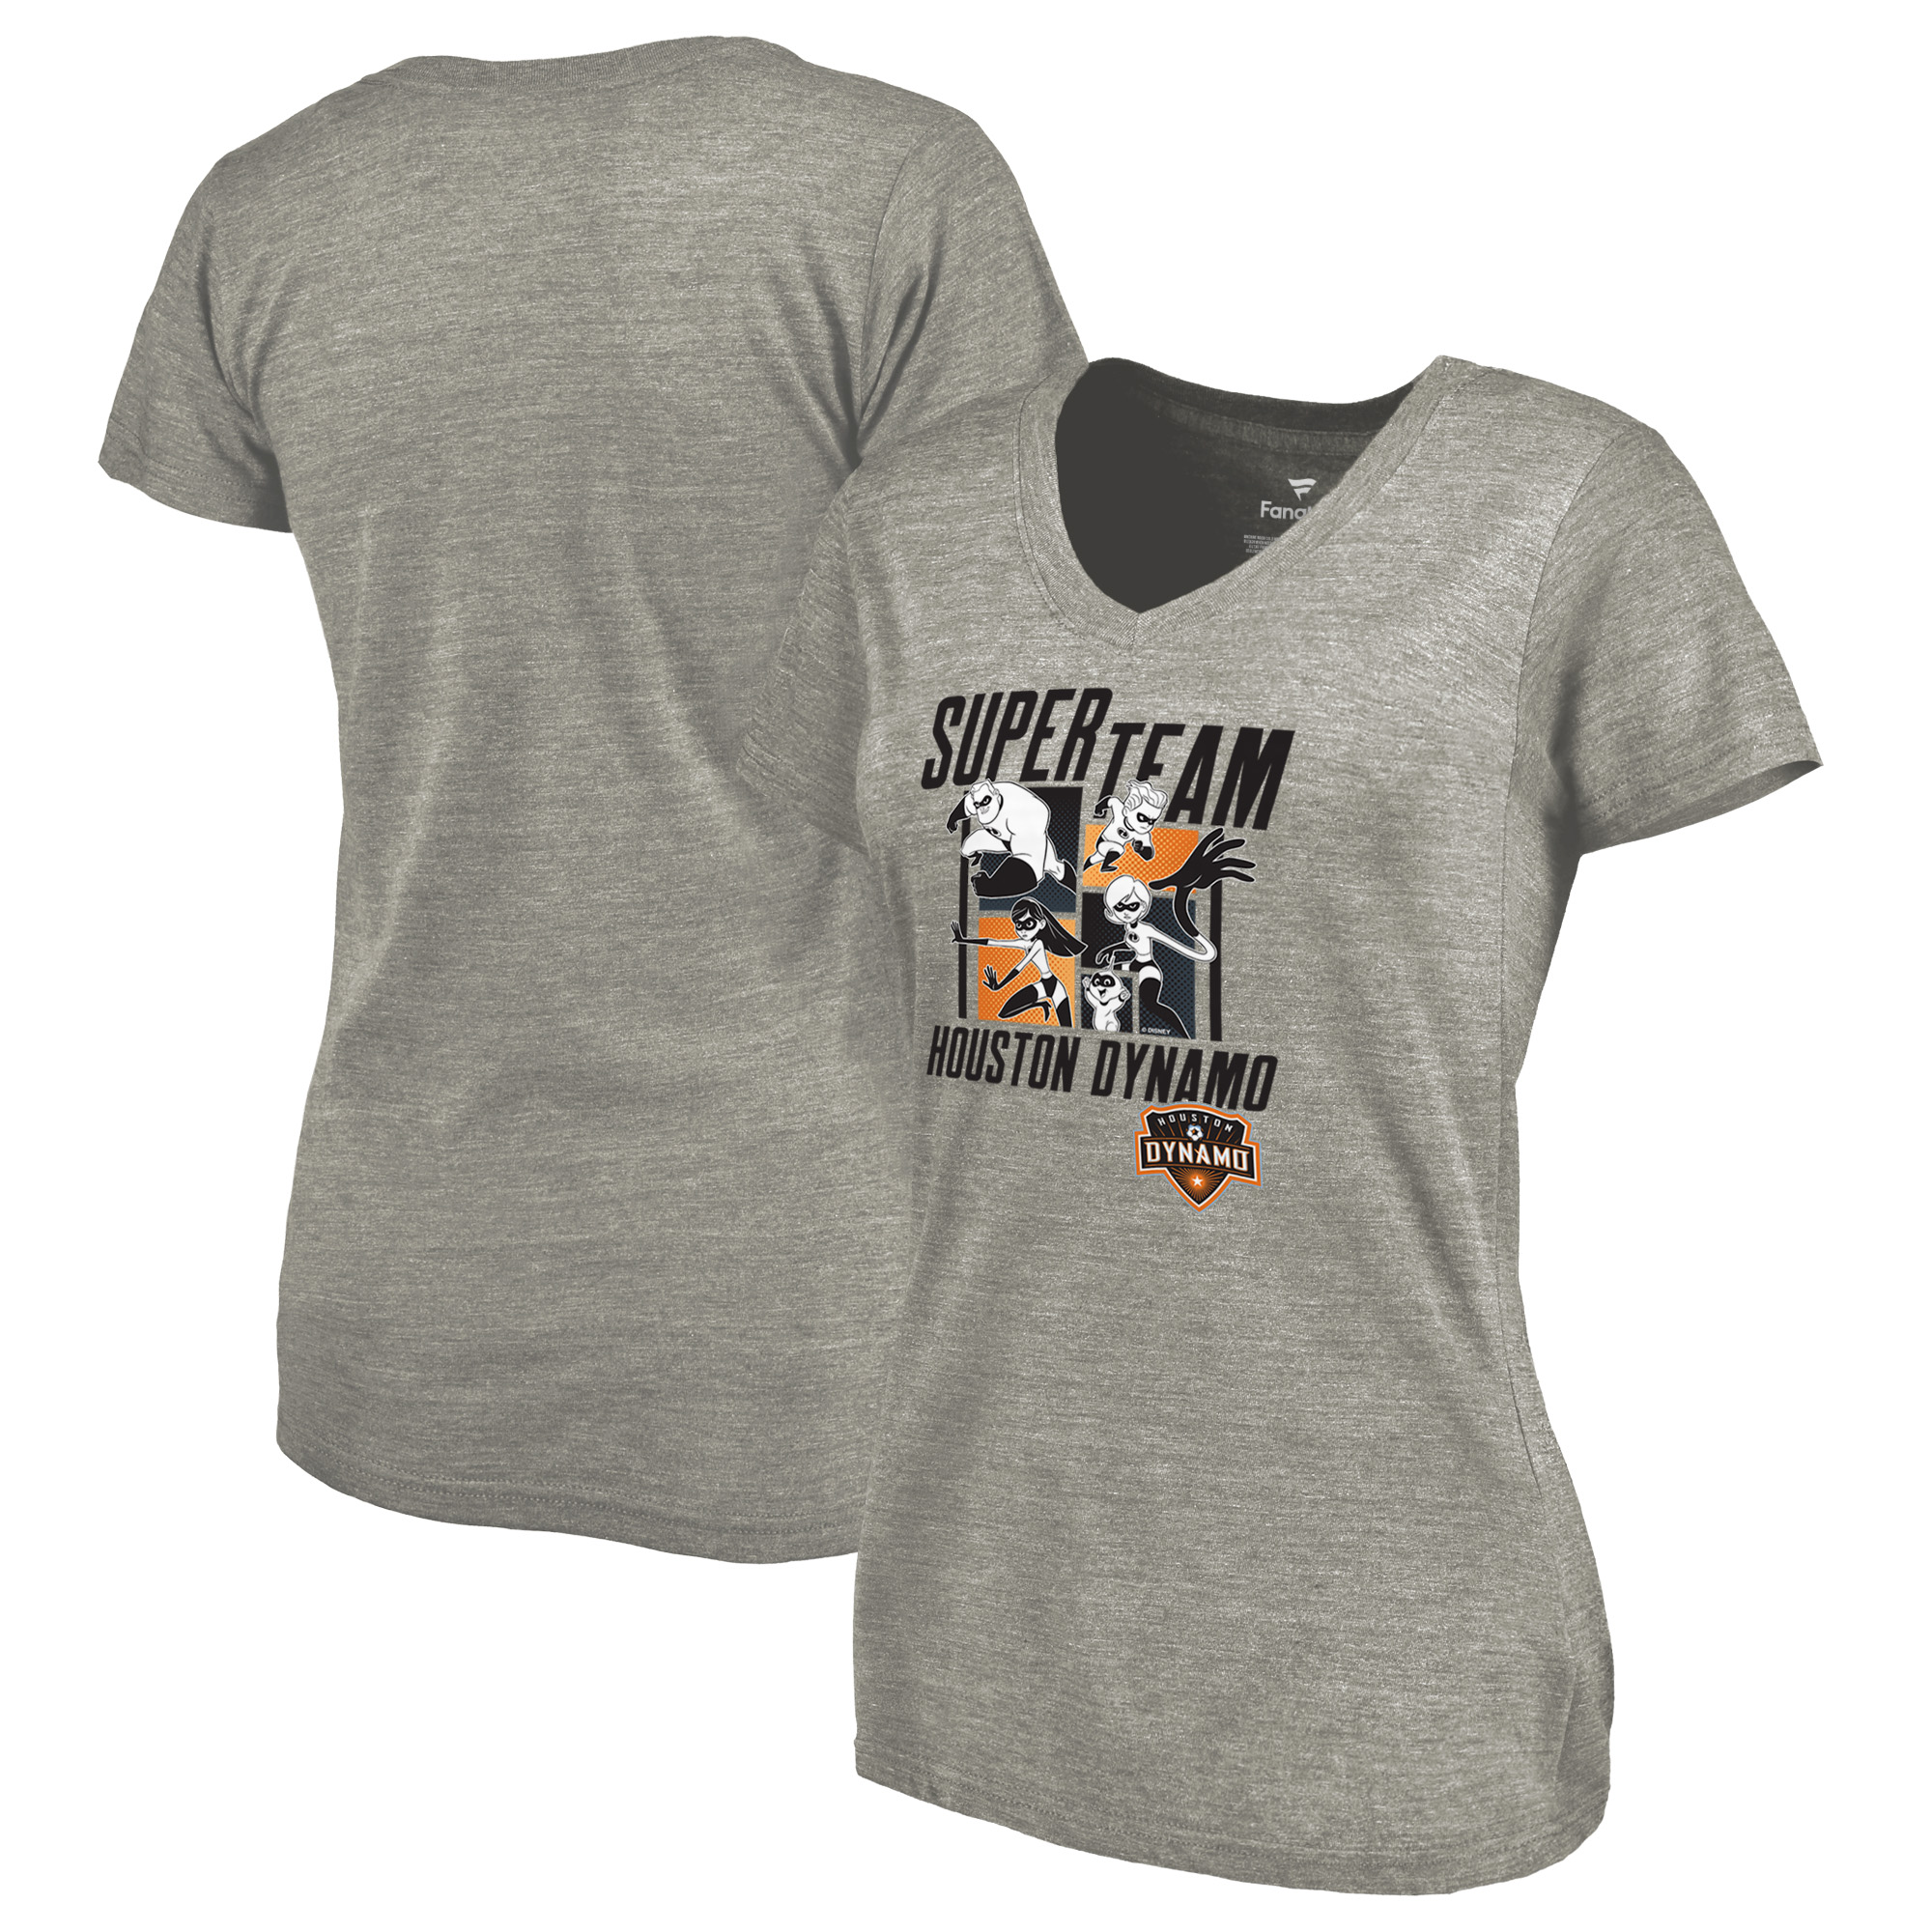 Houston Dynamo Fanatics Branded Women's Disney Pixar The Incredibles Super Team Tri-Blend V-Neck T-Shirt - Heathered Gray